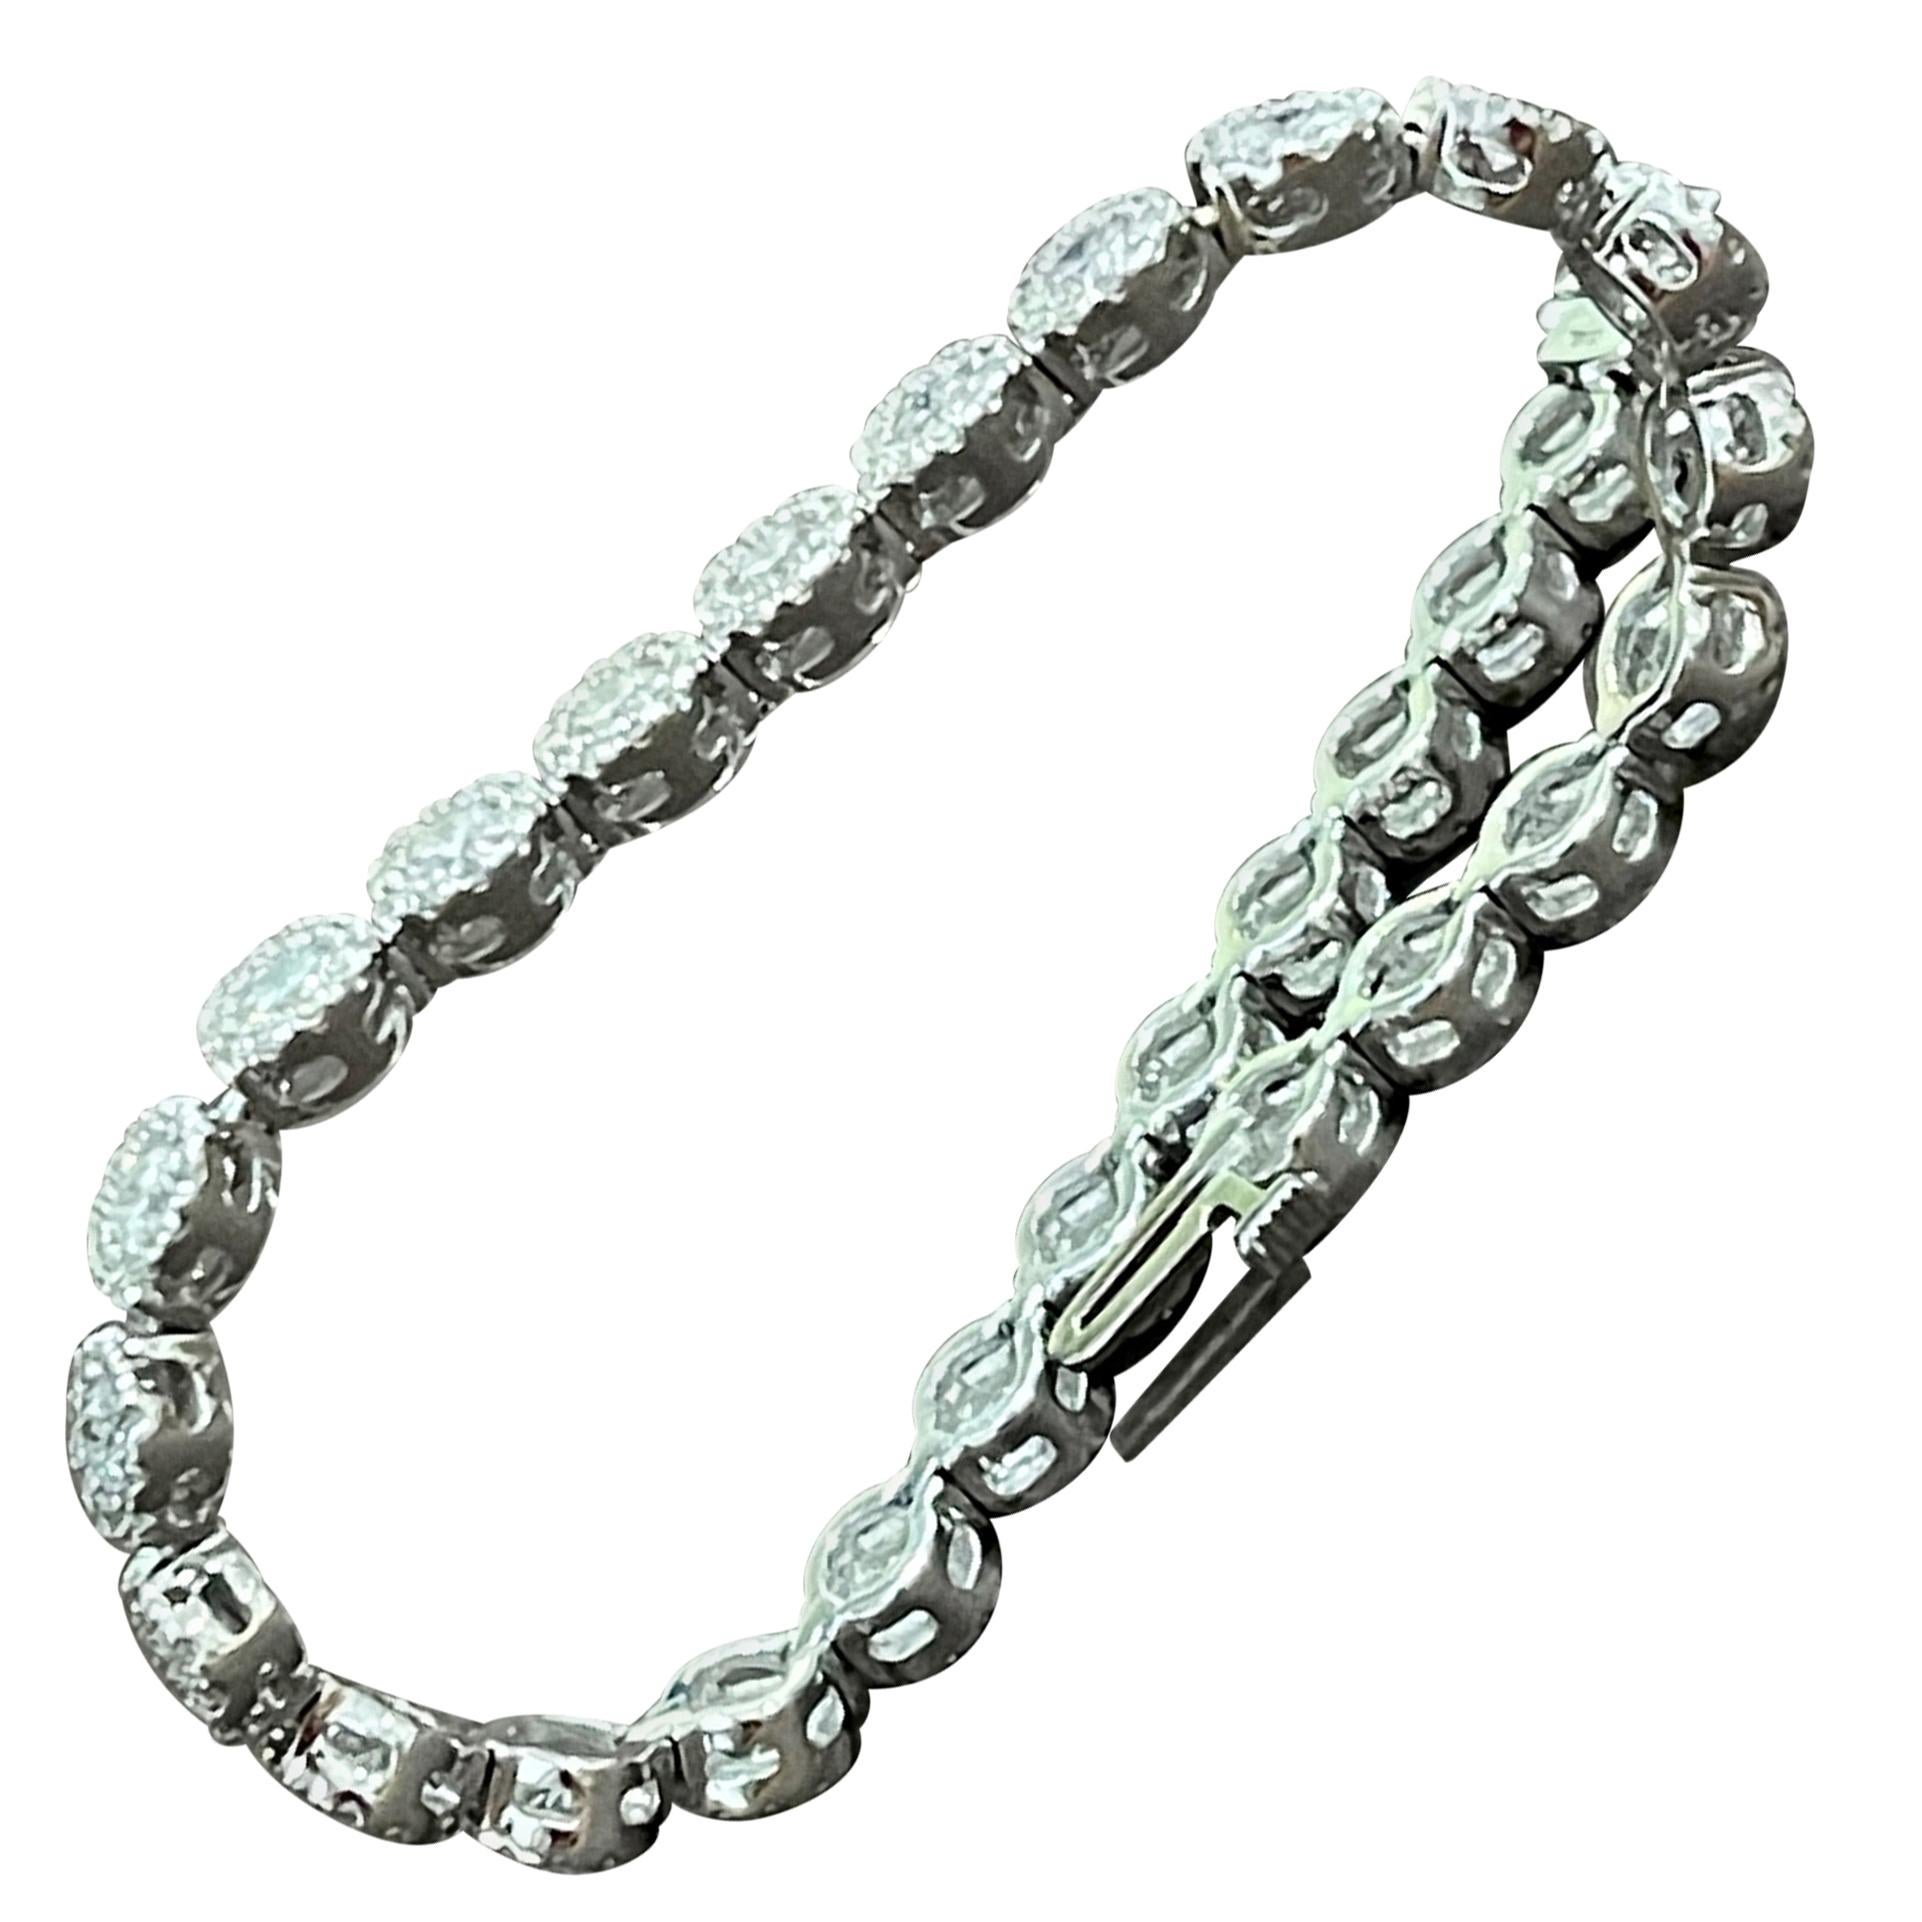 Effy's 5.5 Carat Basel Set Diamond Line Tennis Bracelet in 14 Karat White Gold